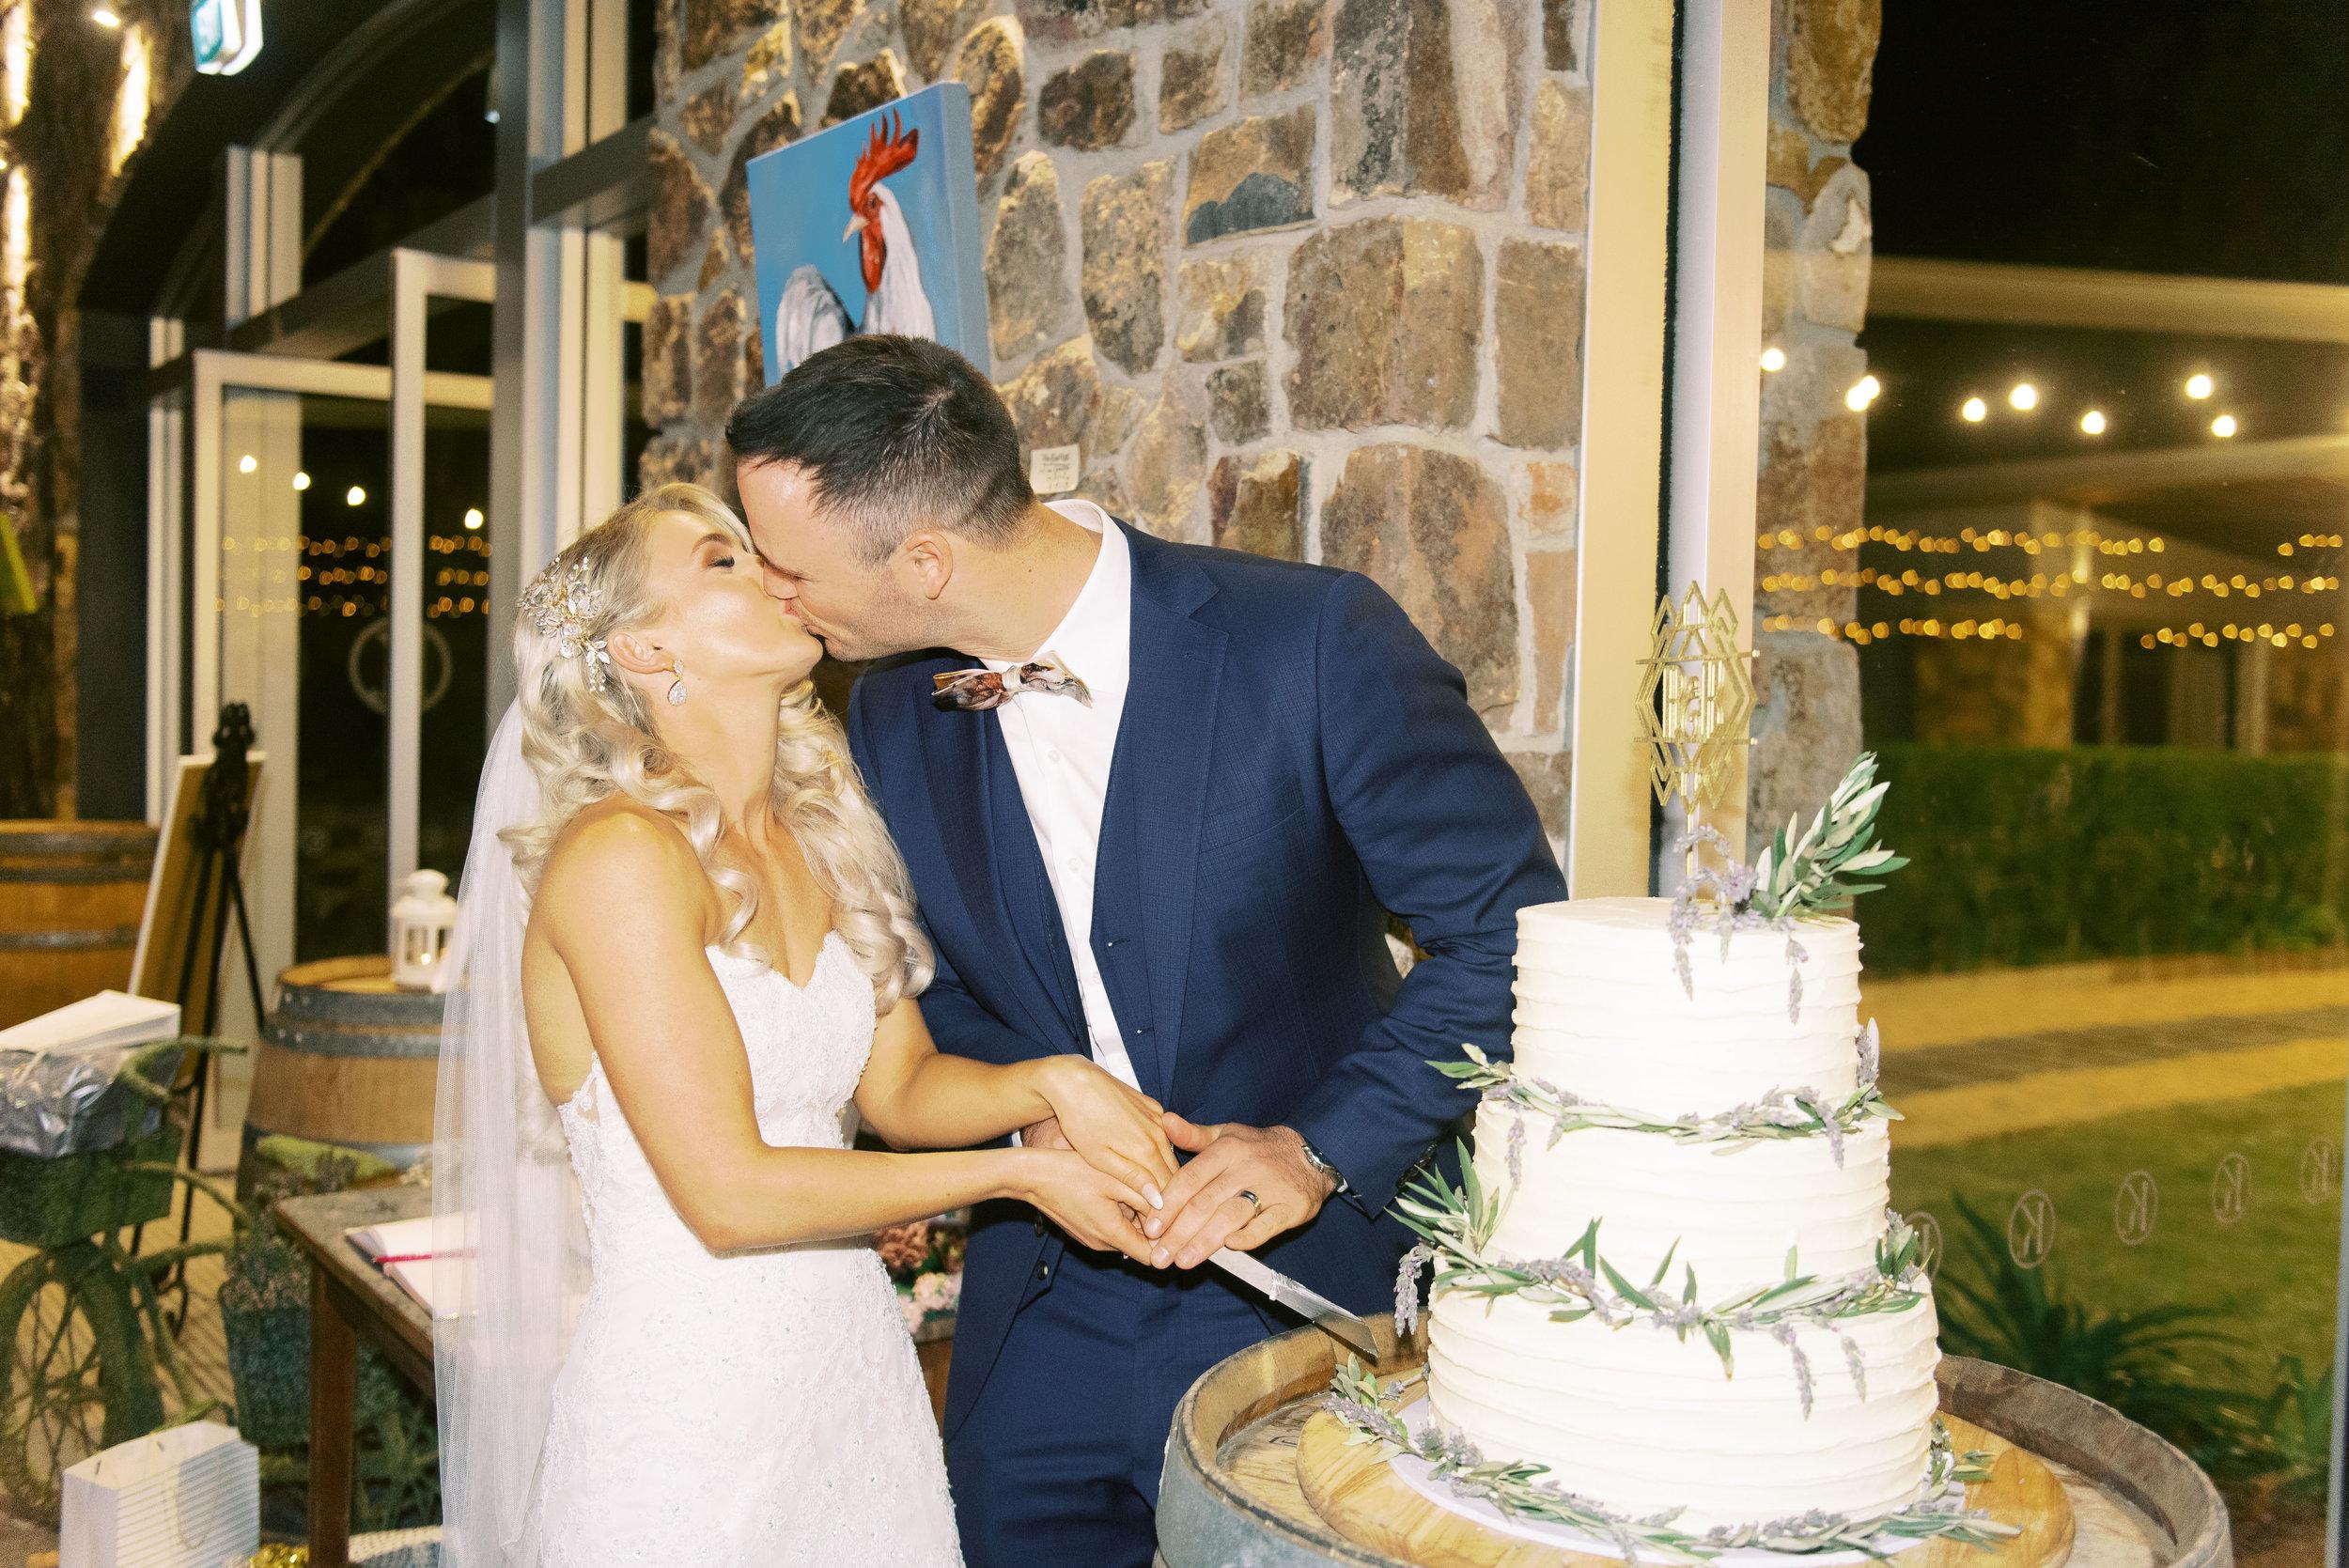 Kooroomba-Vineyard-Lavender-Farm-Wedding-Fine-Art-Lauren-Olivia-82.jpg